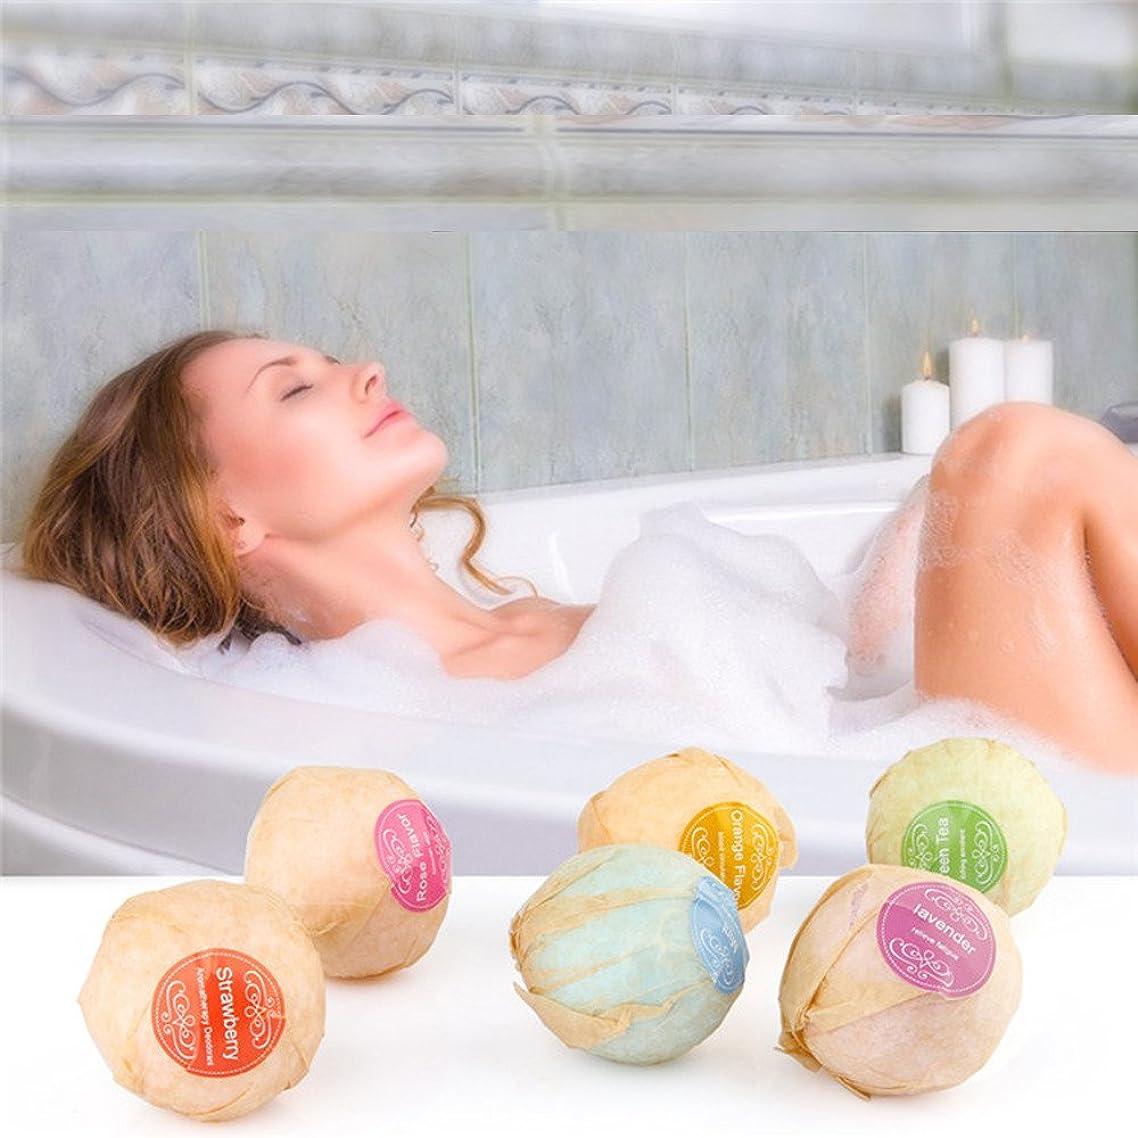 Iulove Organic Bath Bombs Bubble Bath Salts Ball Essential Oil Handmade SPA Stress